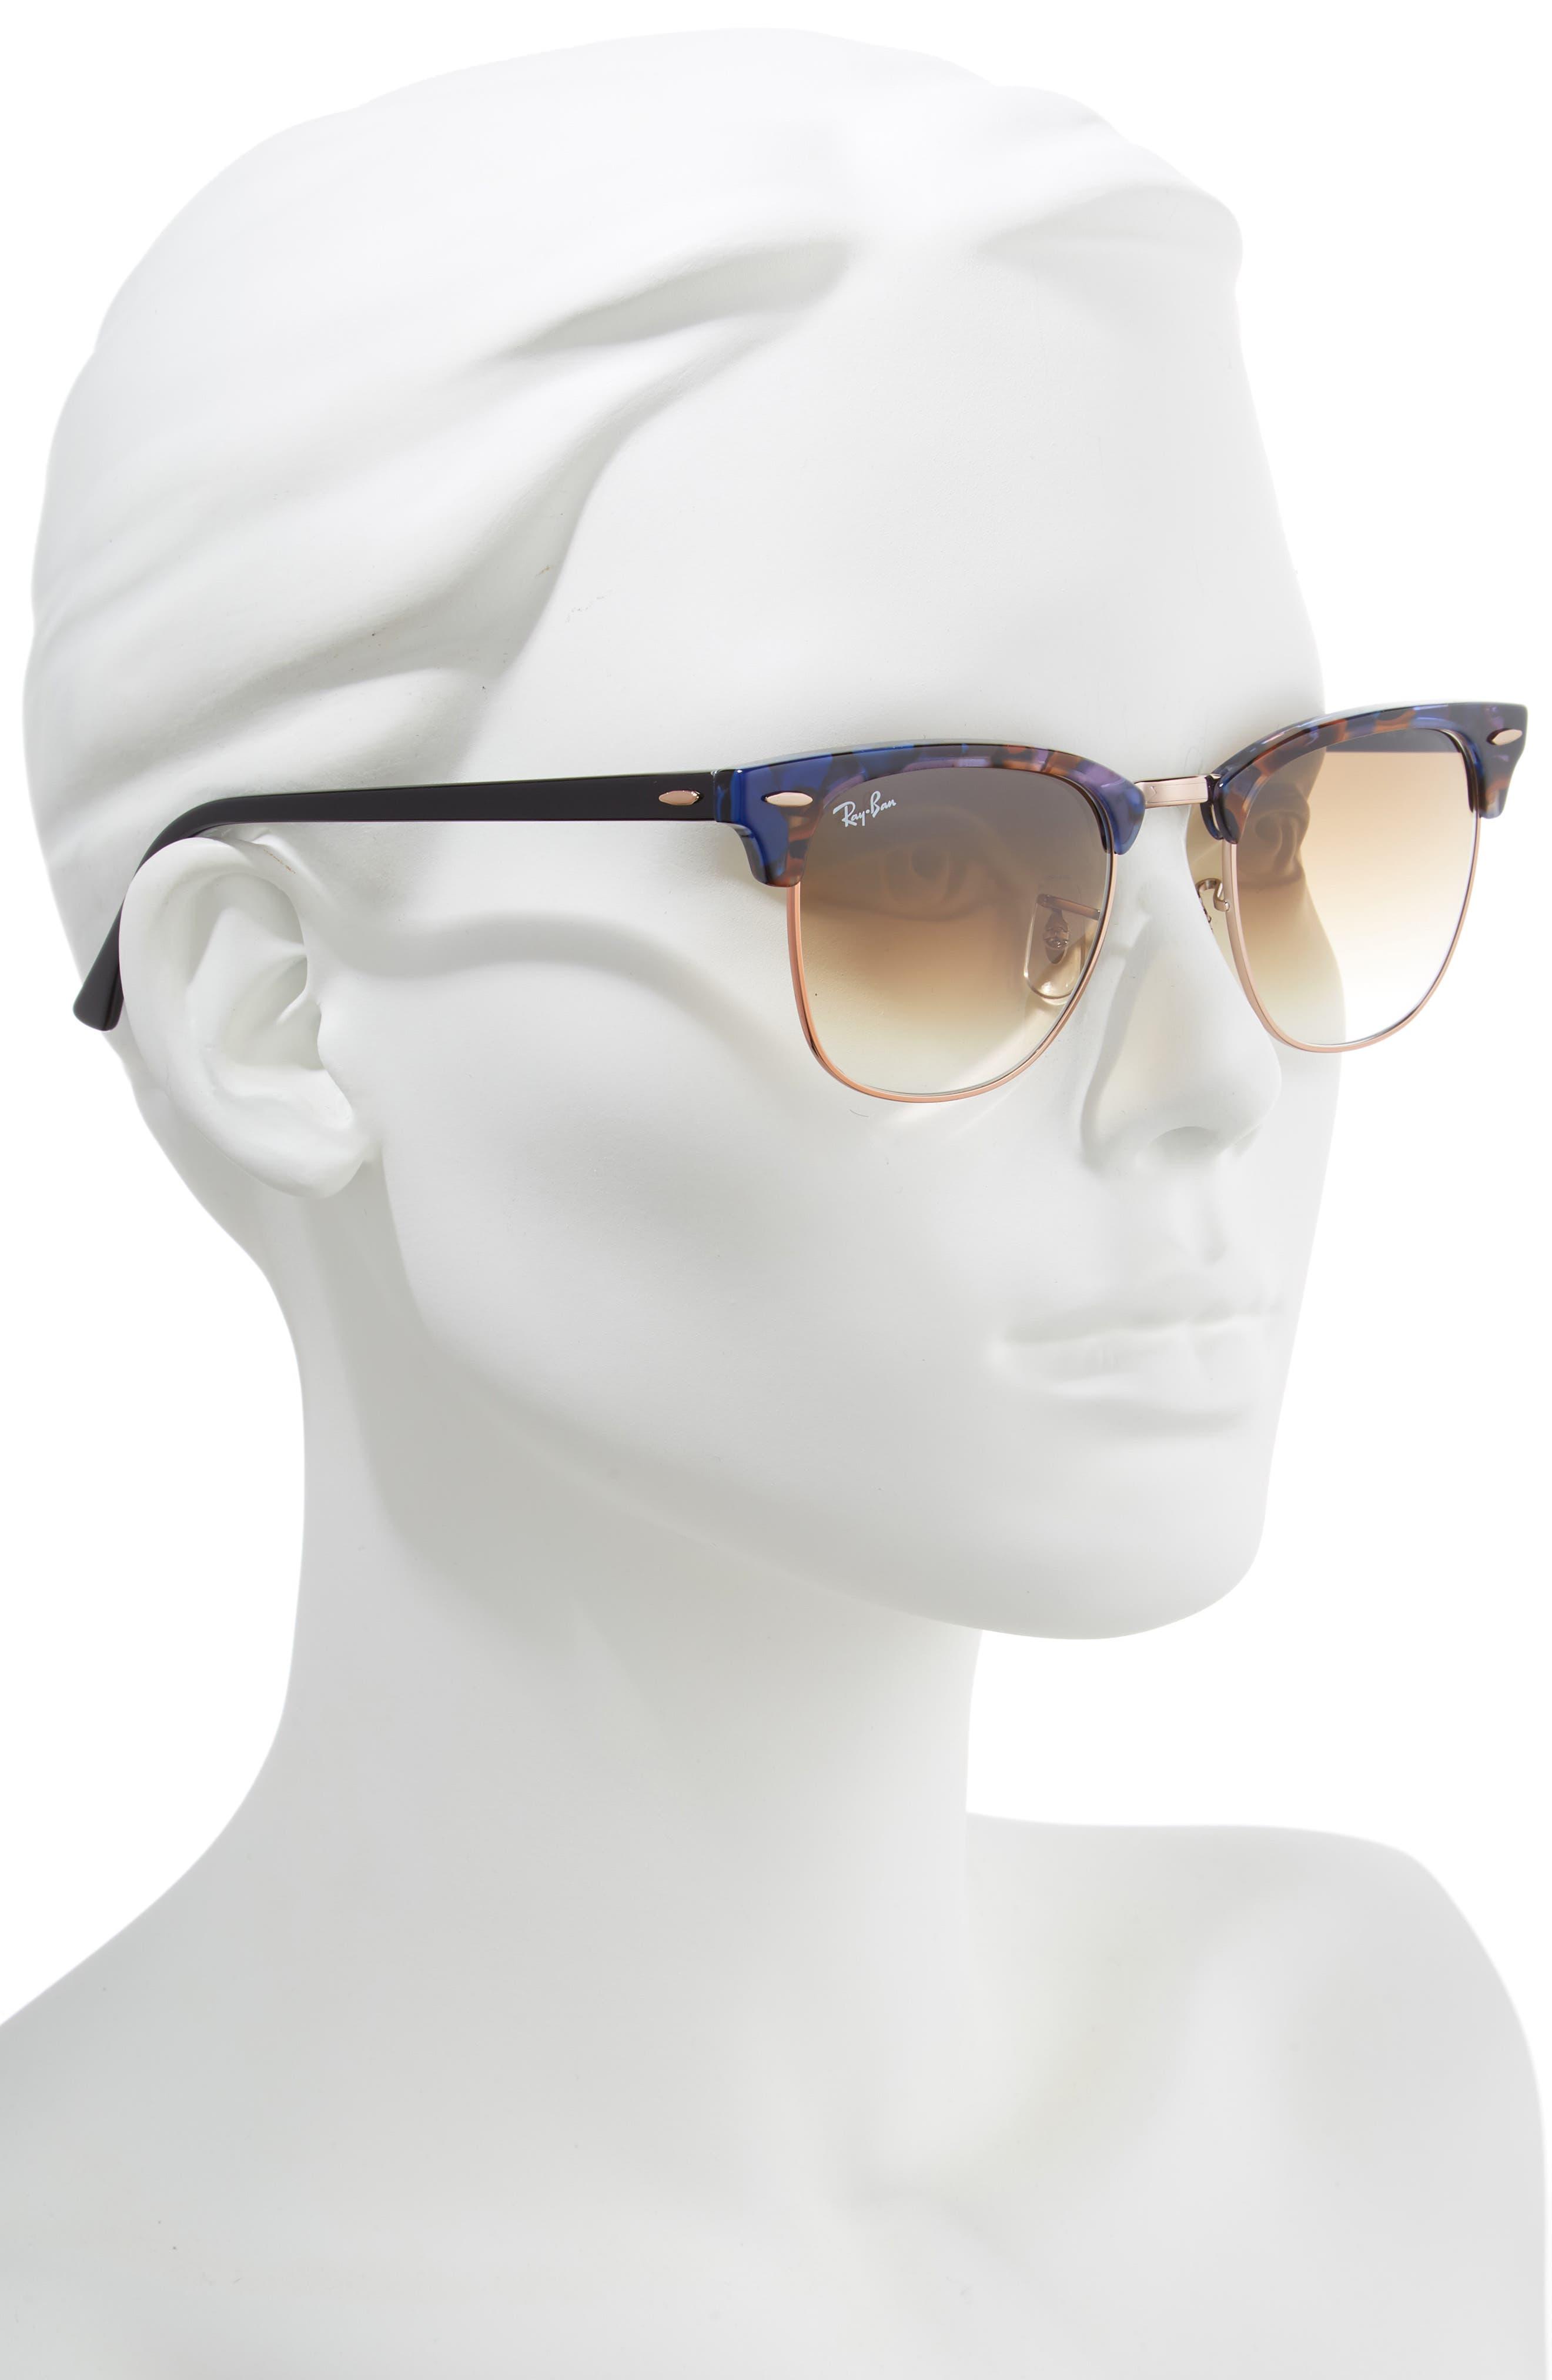 92b47f0b0f Ray-Ban Clubmaster Sunglasses